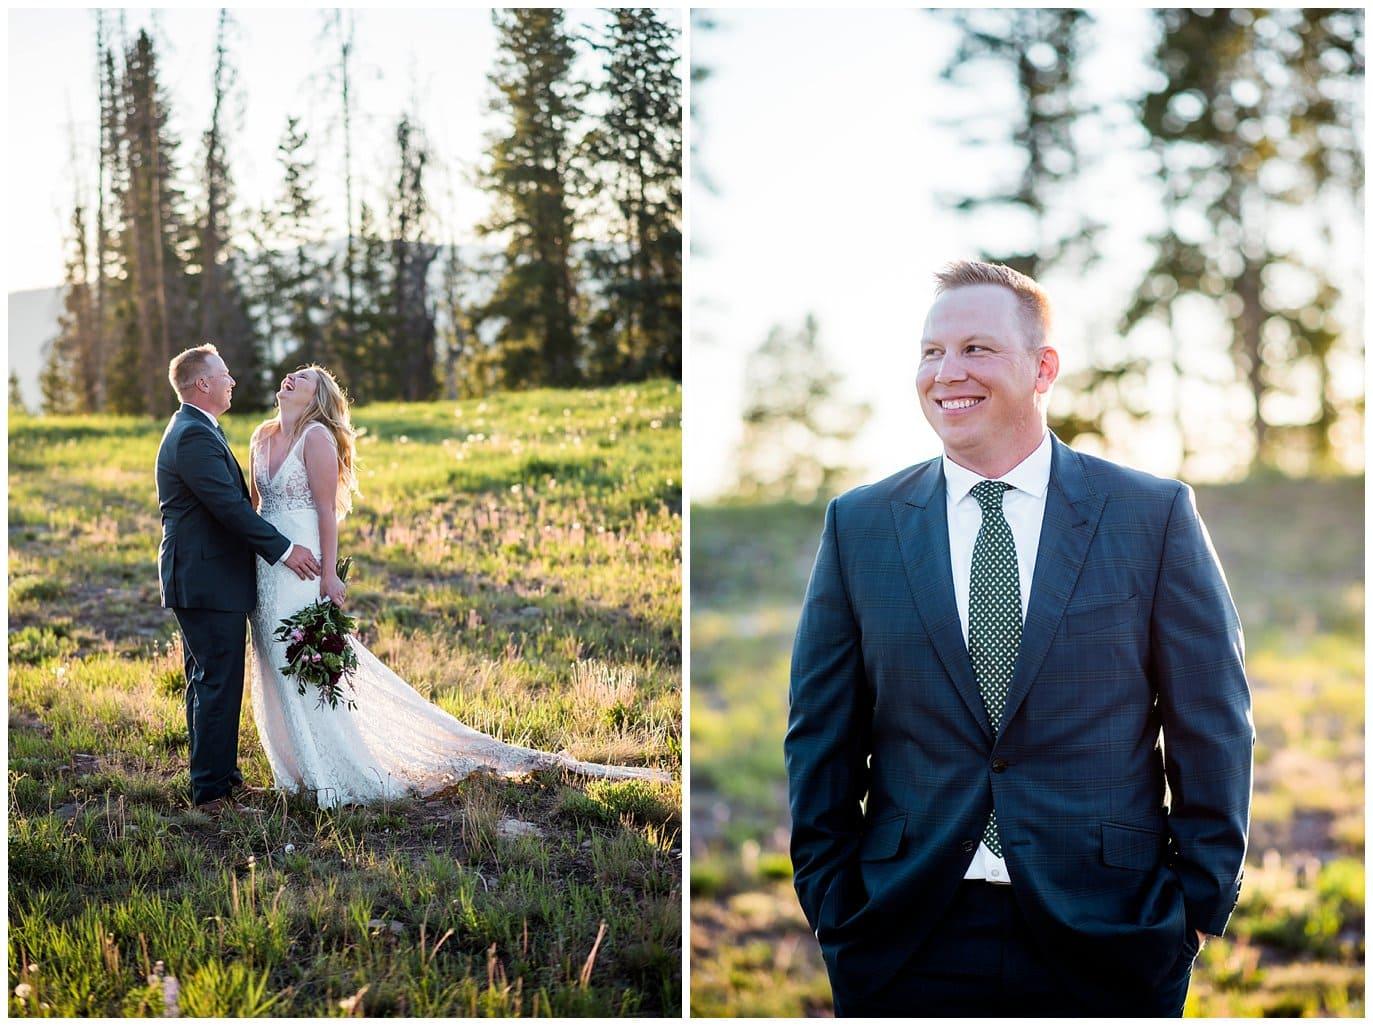 Vail Wedding Deck wedding photo